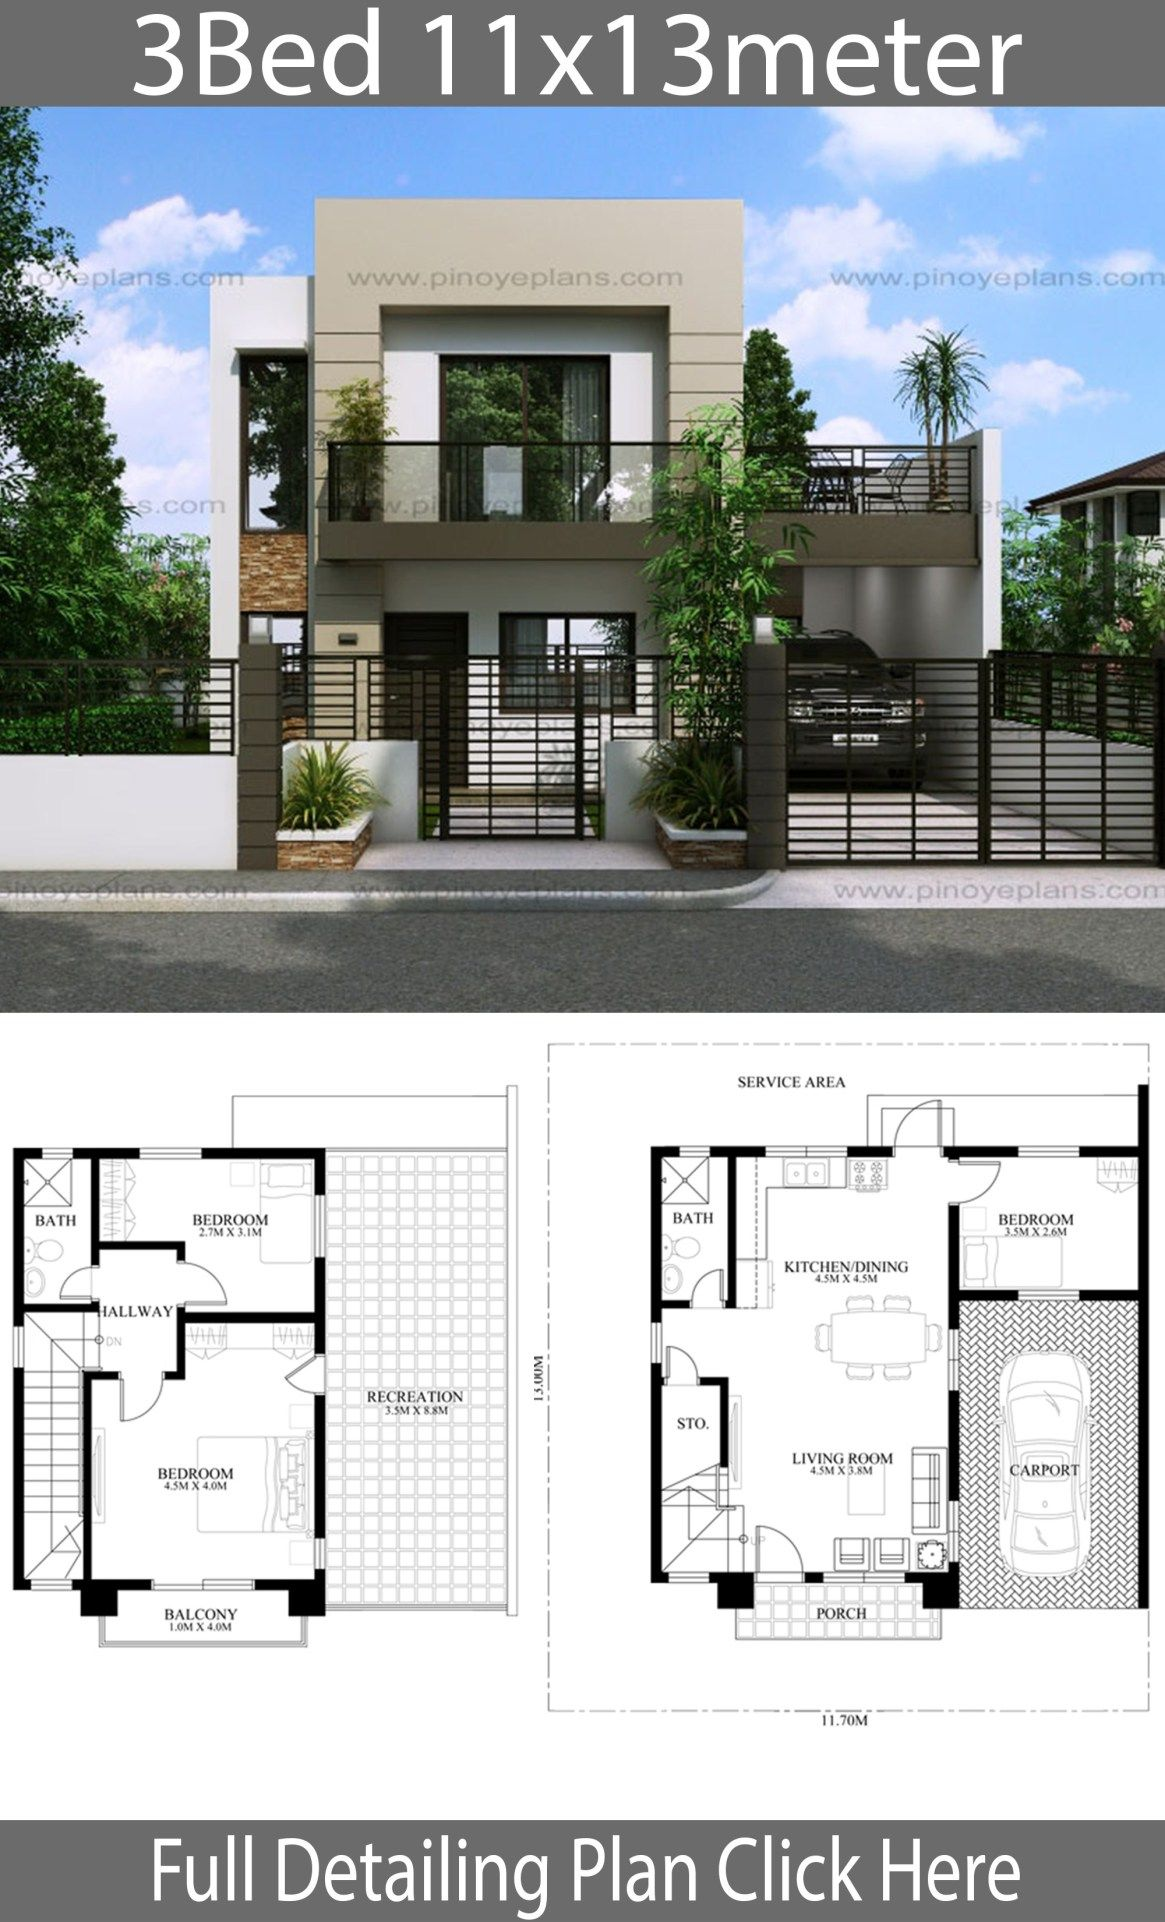 House Design 11x13m With 3 Bedrooms Home Design With Plansearch Philippines House Design Home Design Floor Plans Duplex House Design